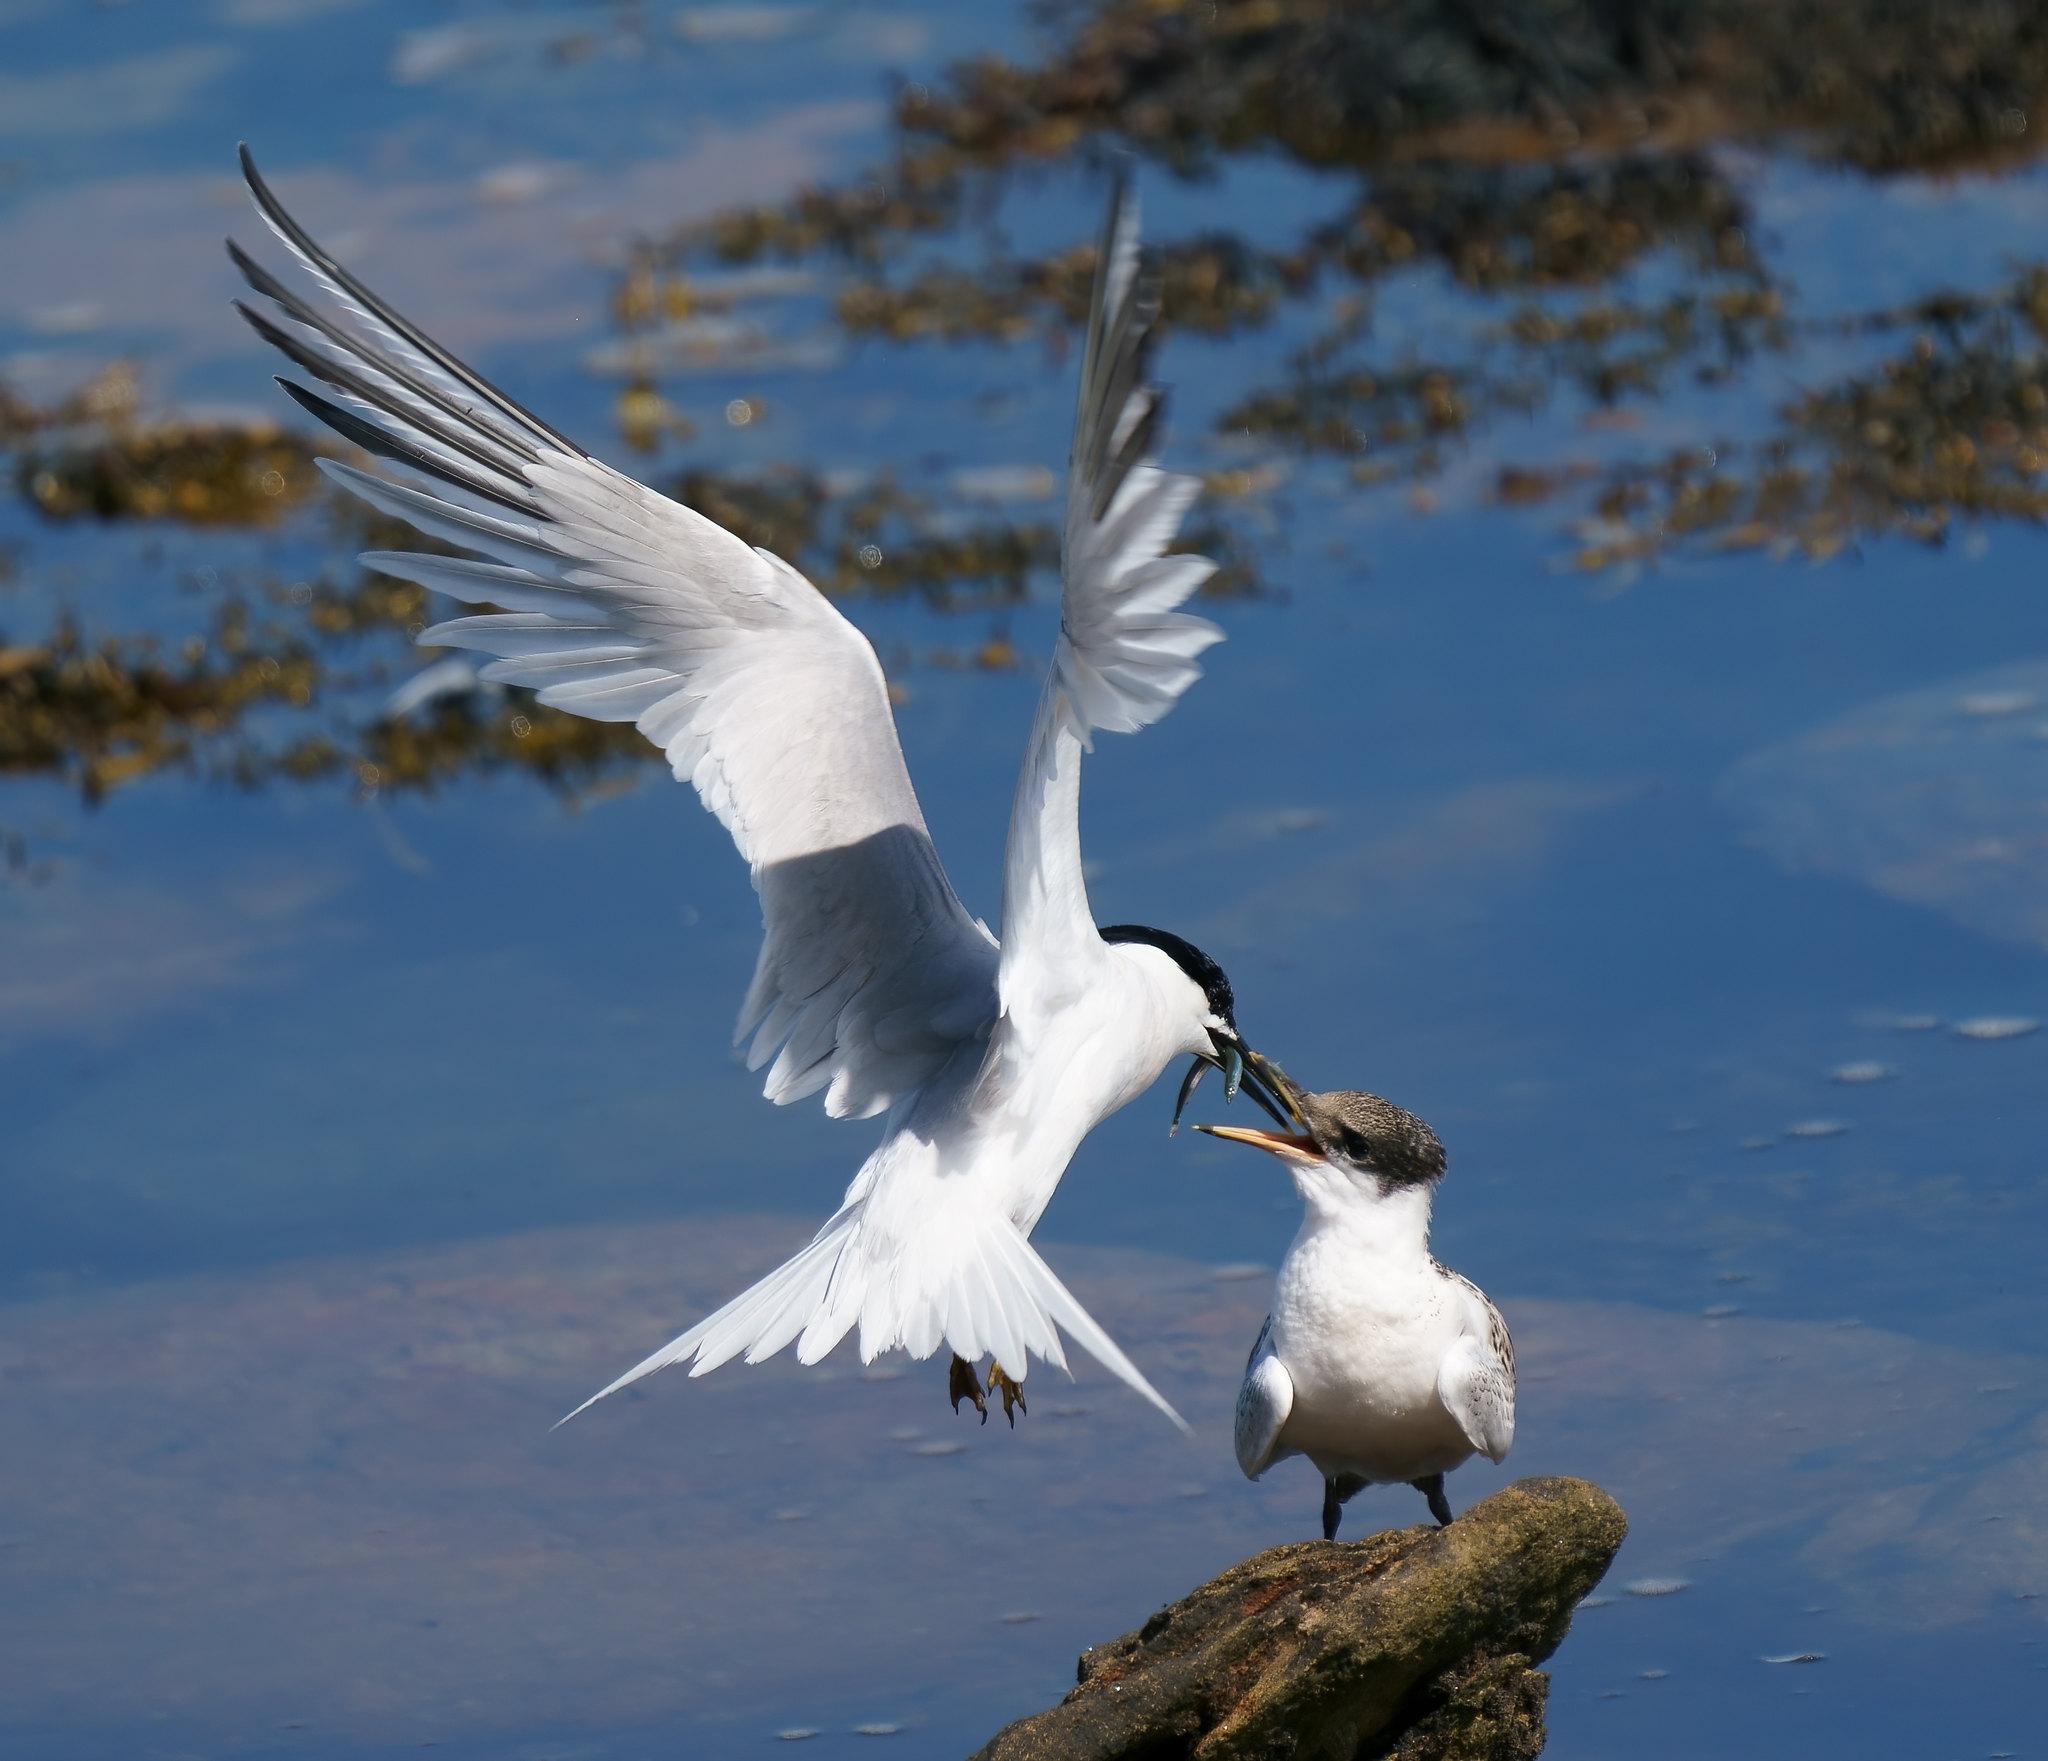 Sandwich Tern dinnertime